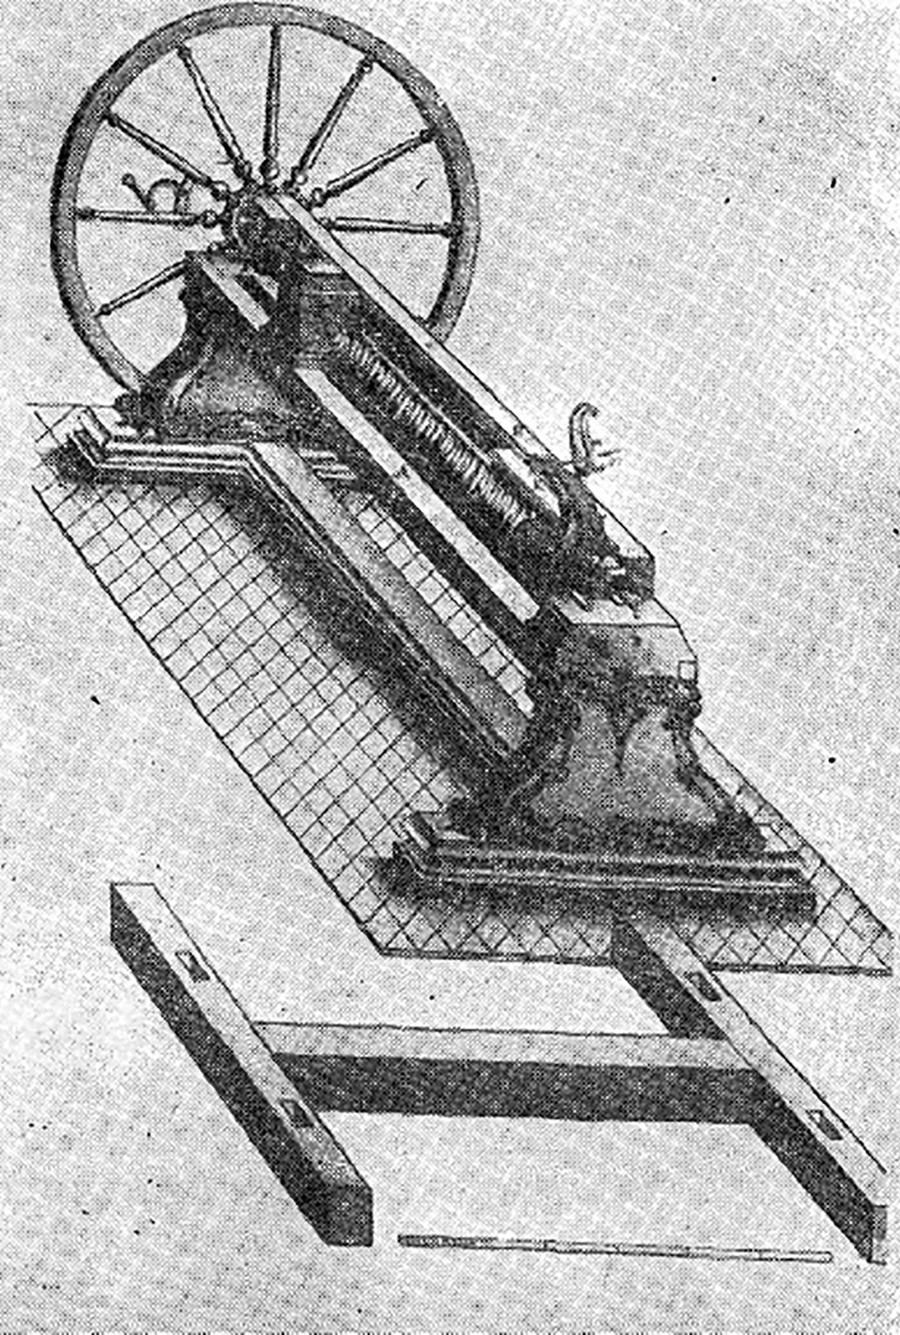 Strug Andreja Nartova za rezanje navoja s mehaničkim nosačem